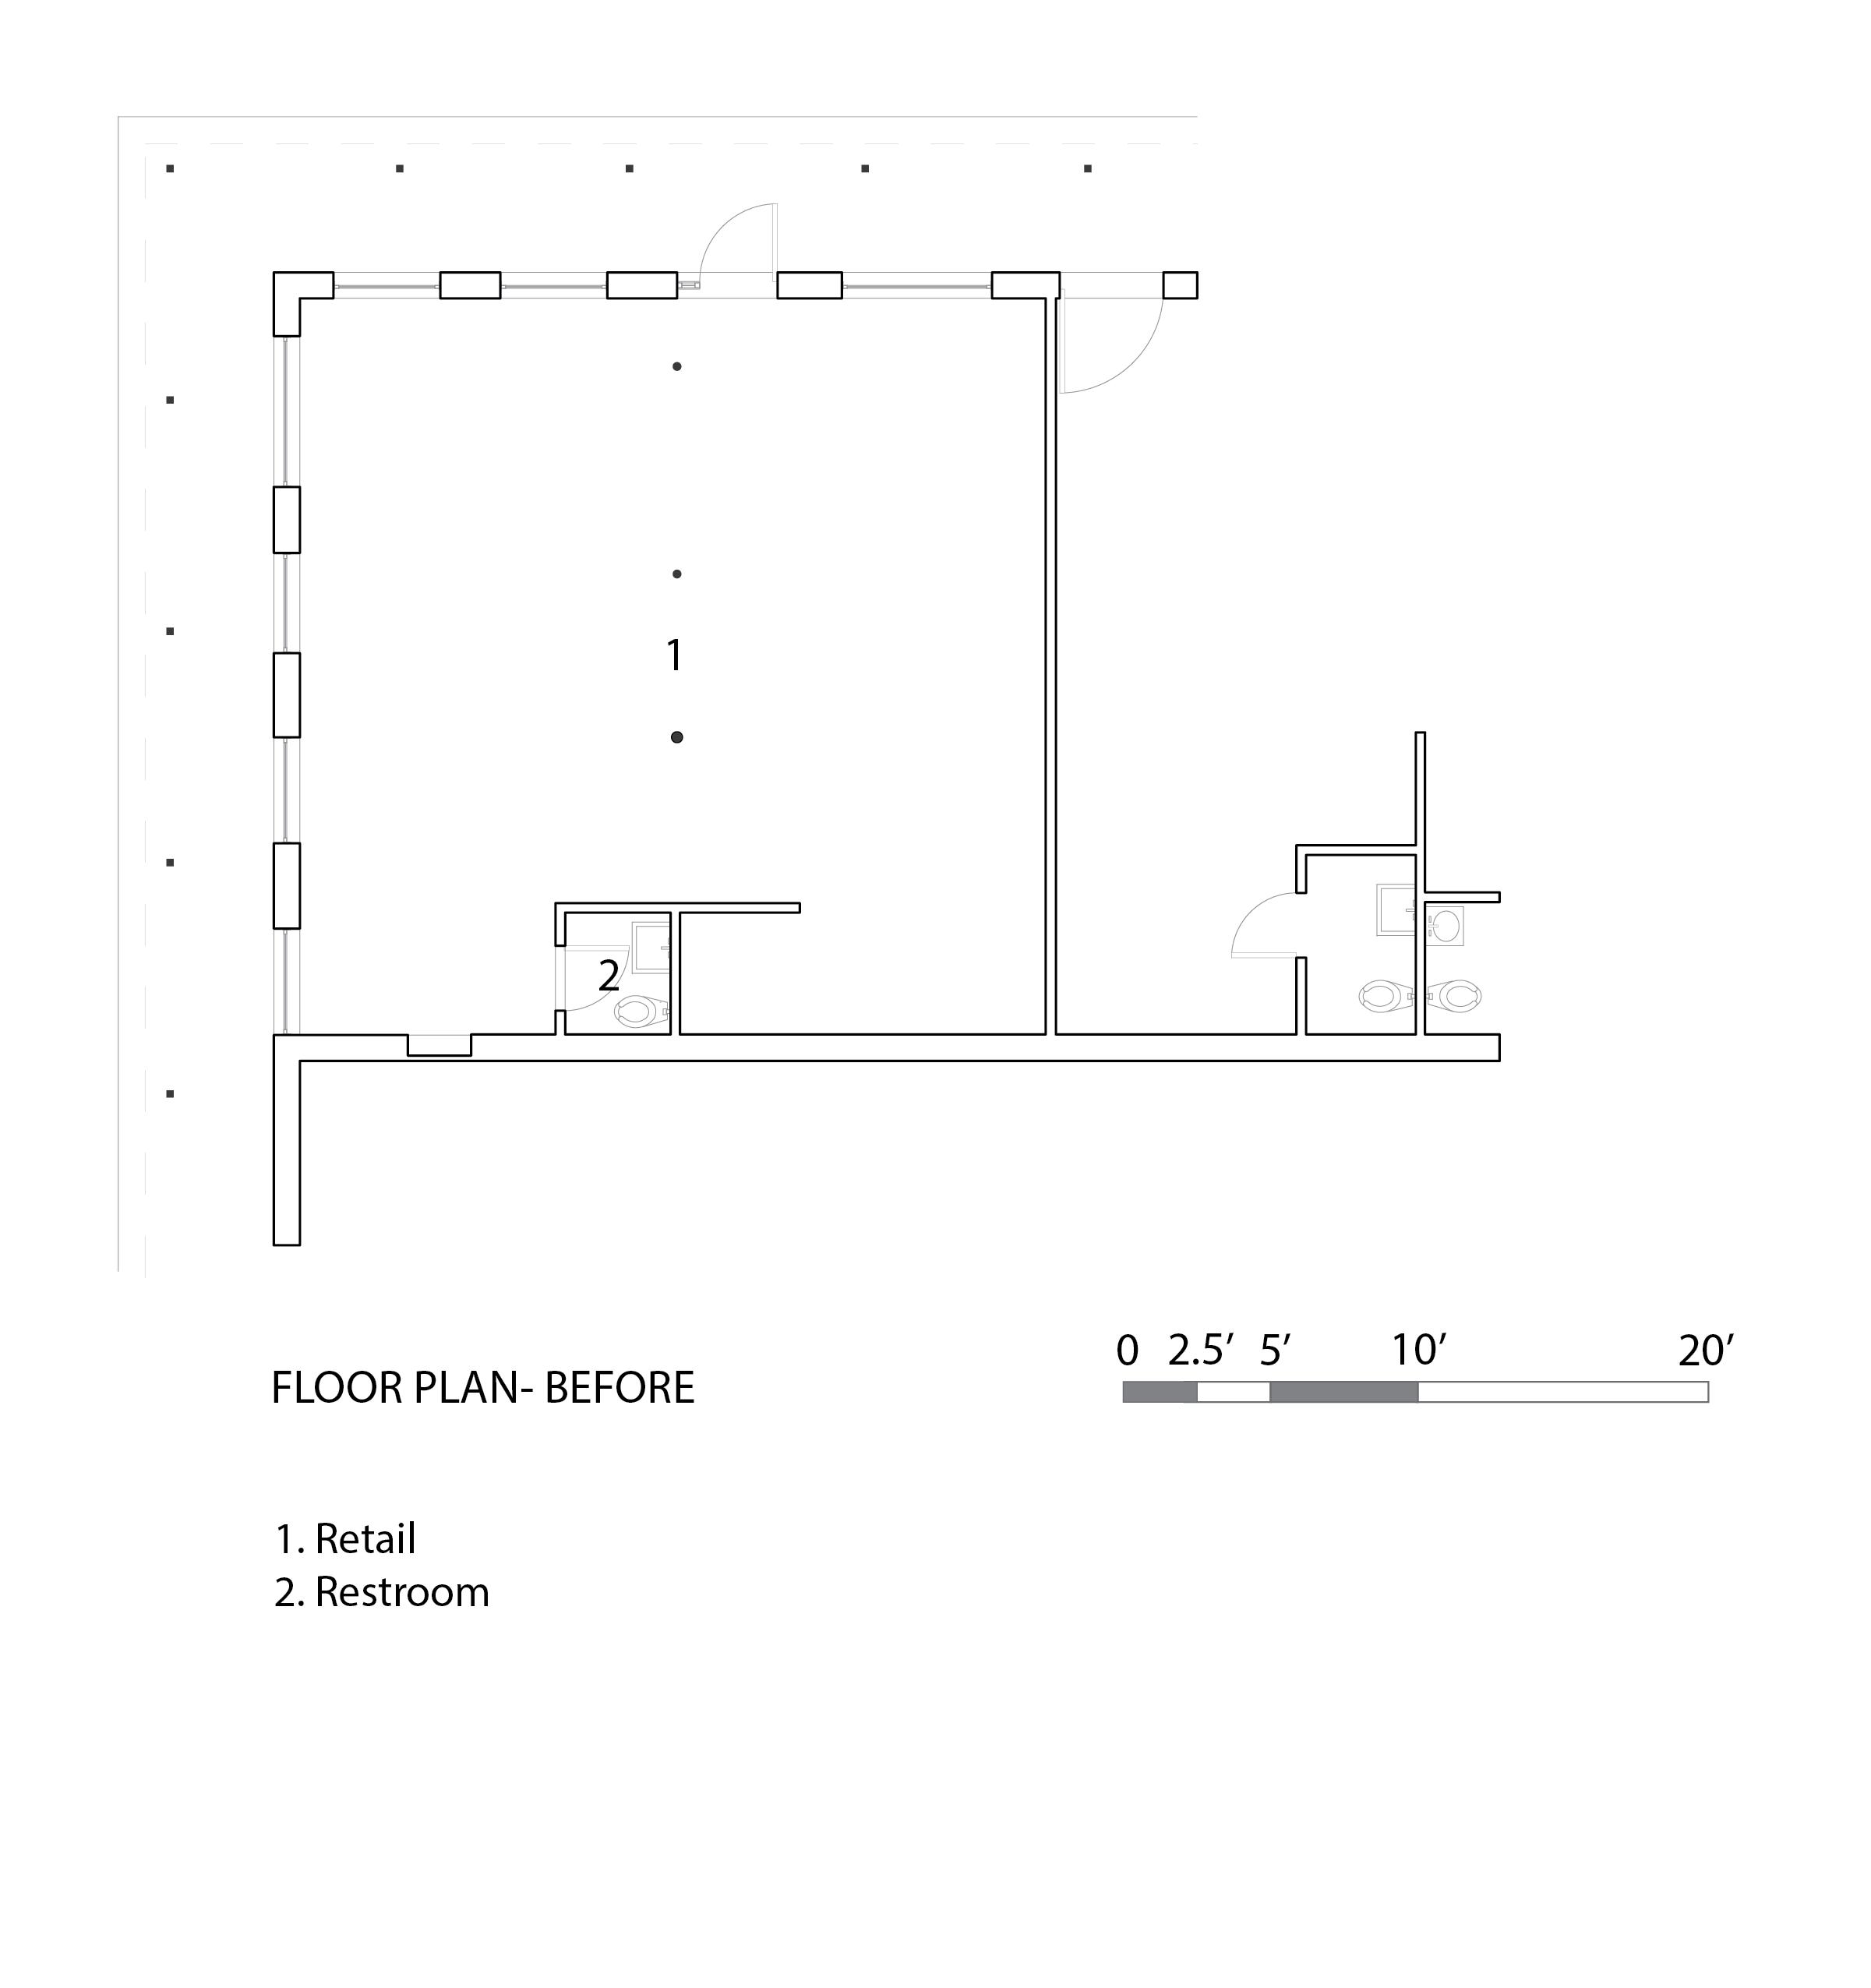 Henris floor plan before.png